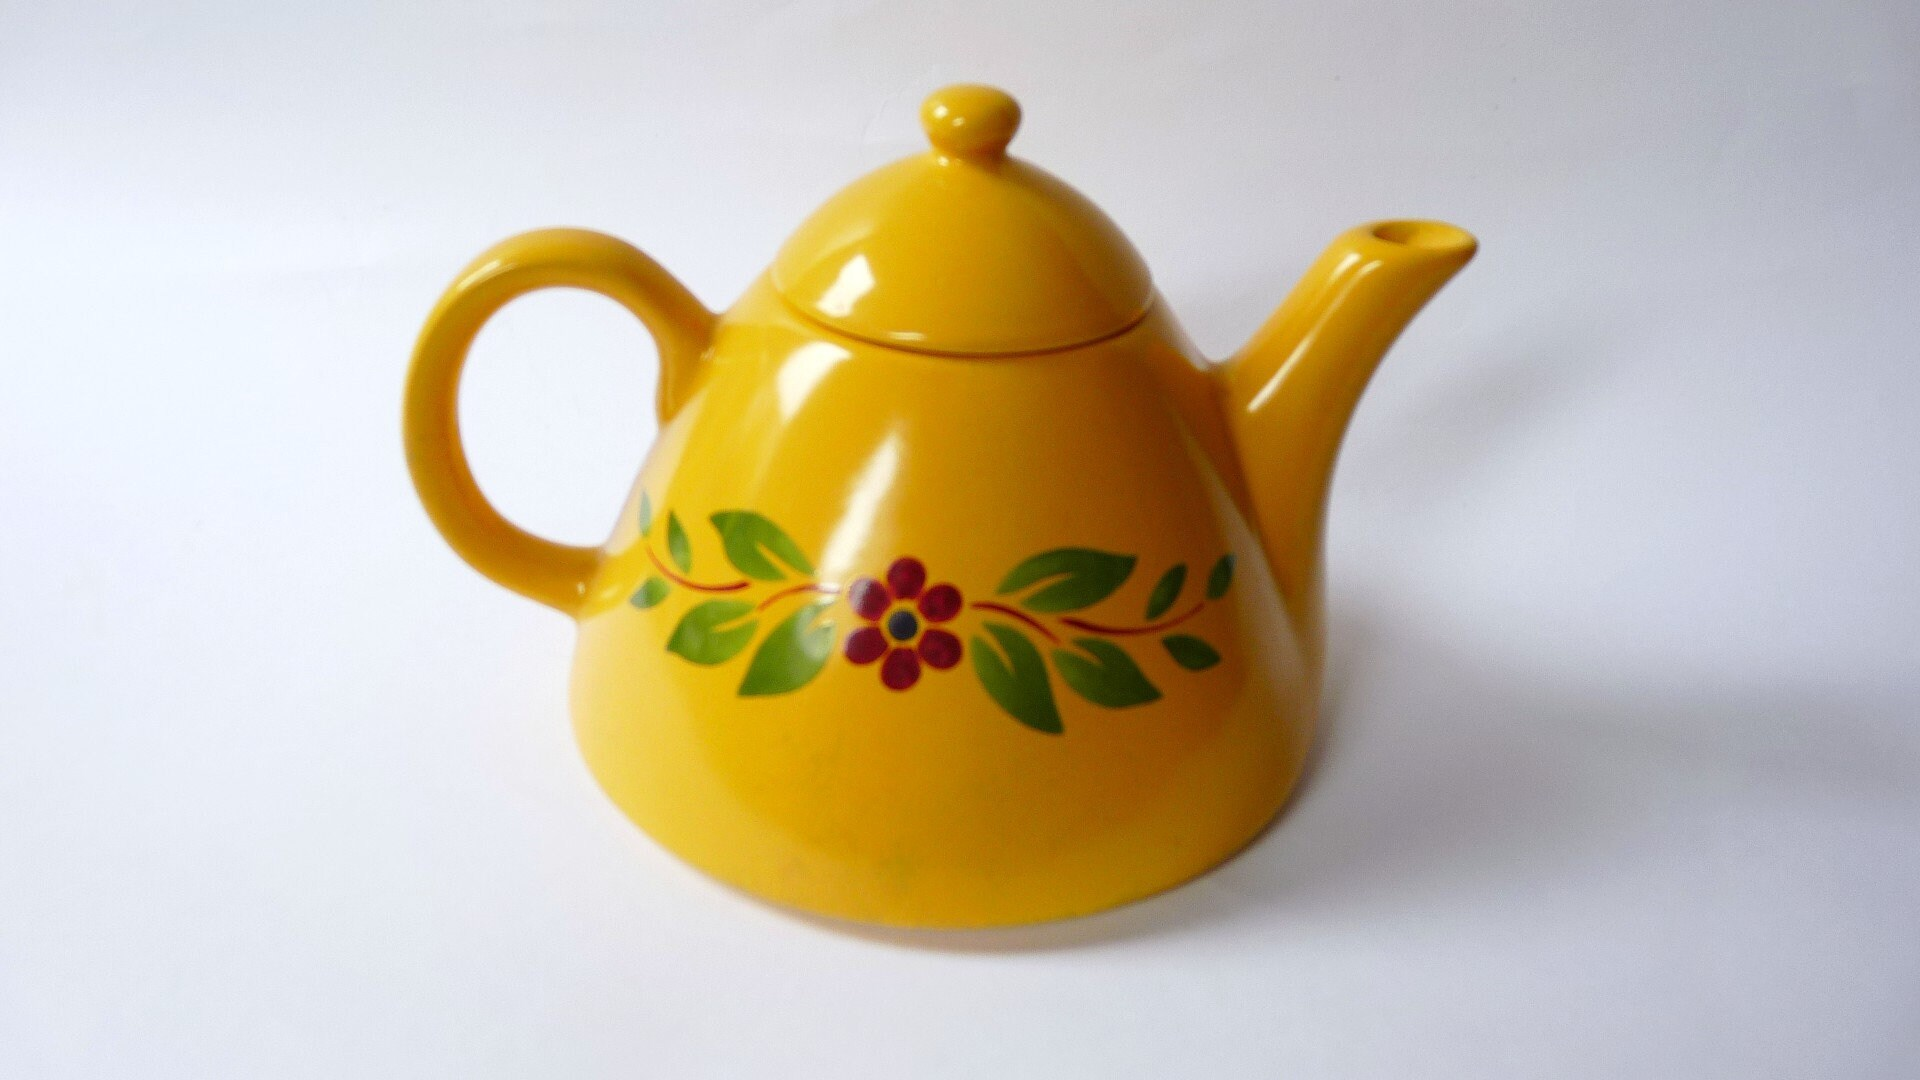 Vintage Yellow Teapot from CHRISTINEHOLM DESIGN STUDIO Sweden   Etsy